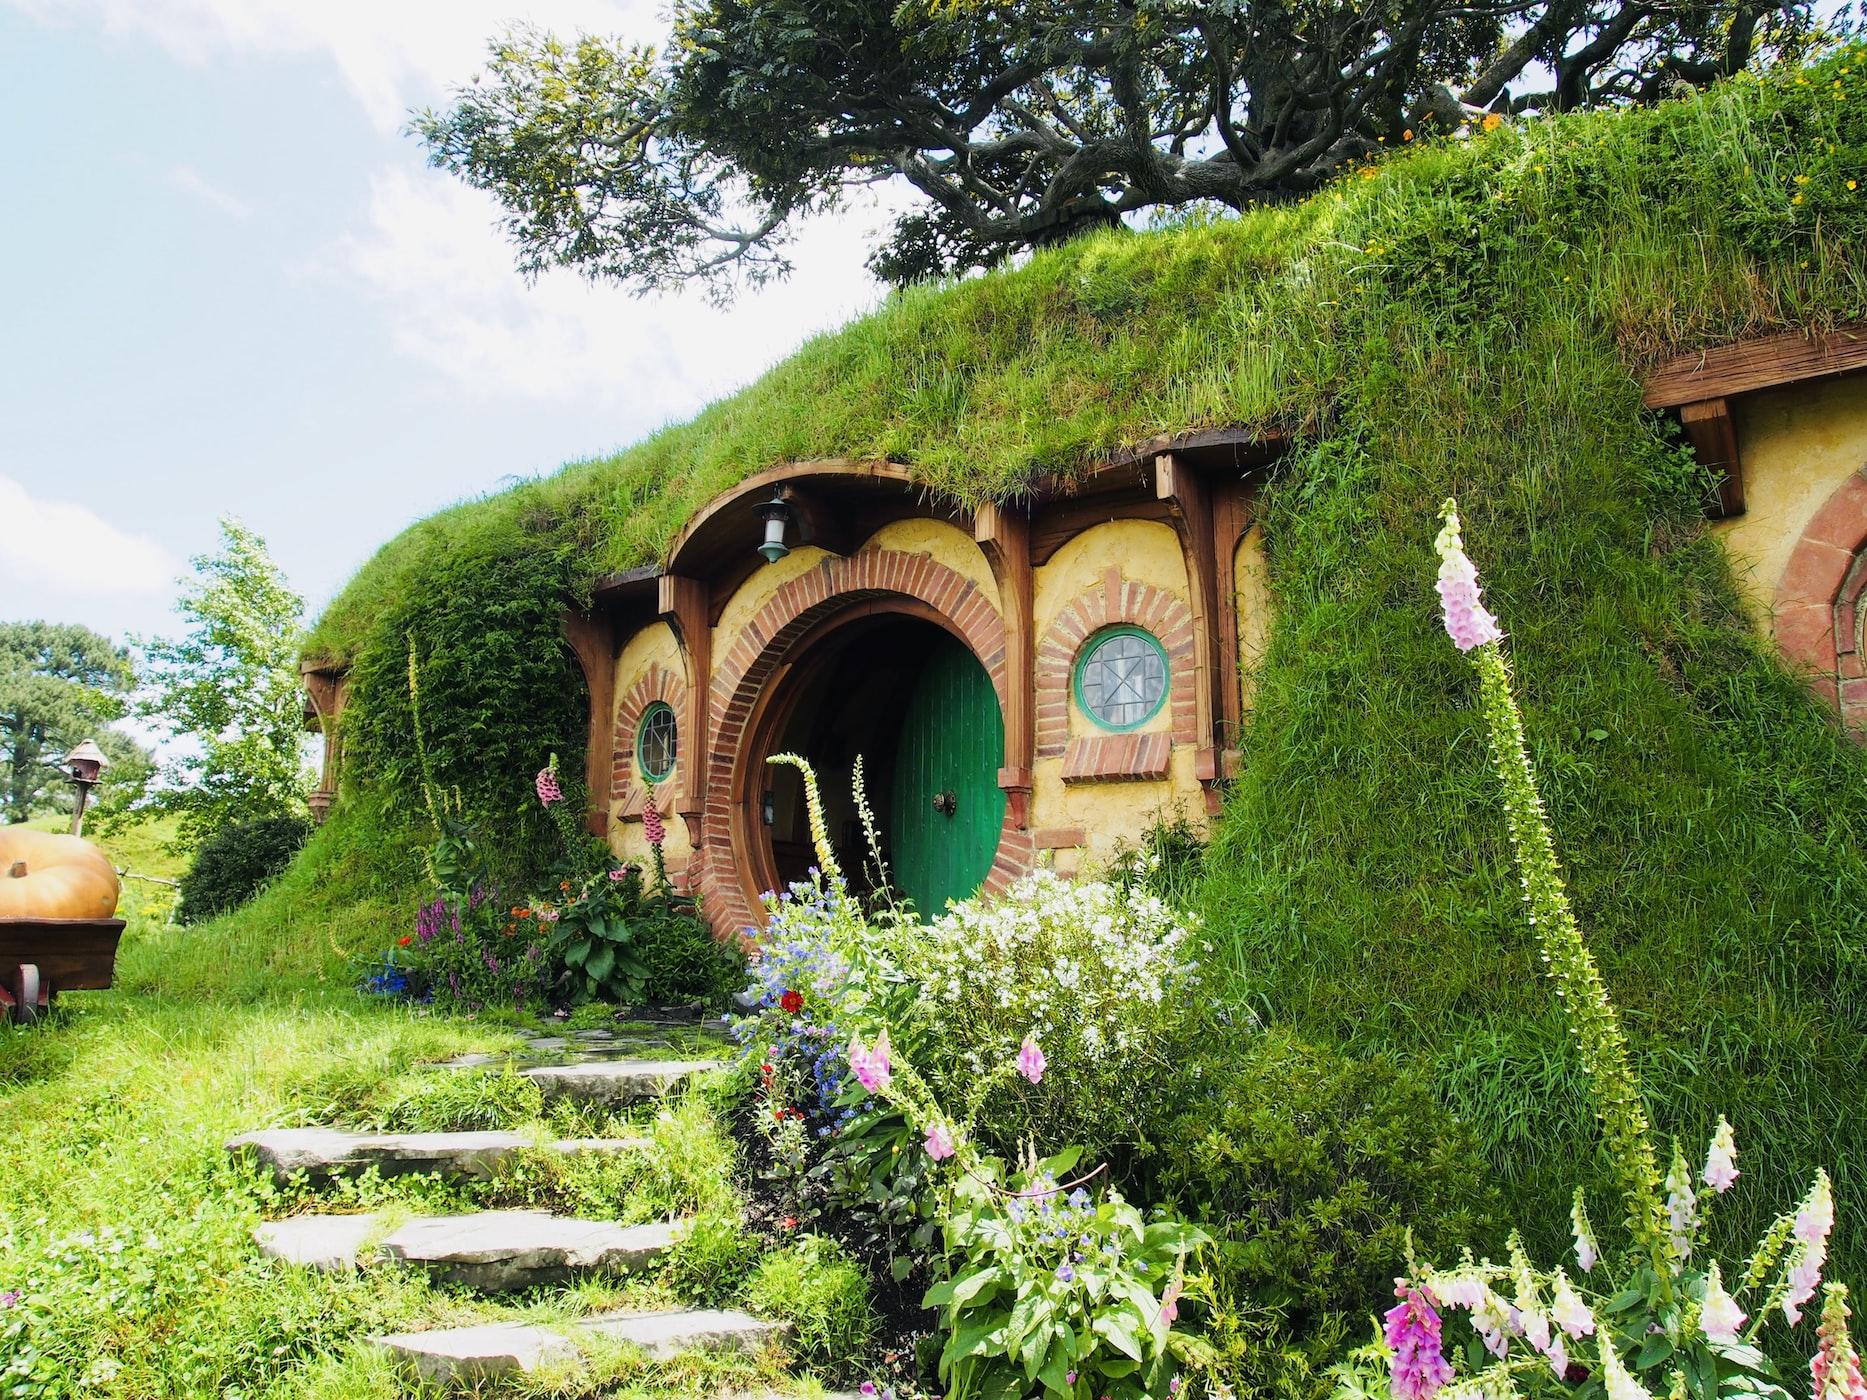 The famous Hobbiton house of Bilbo Baggins